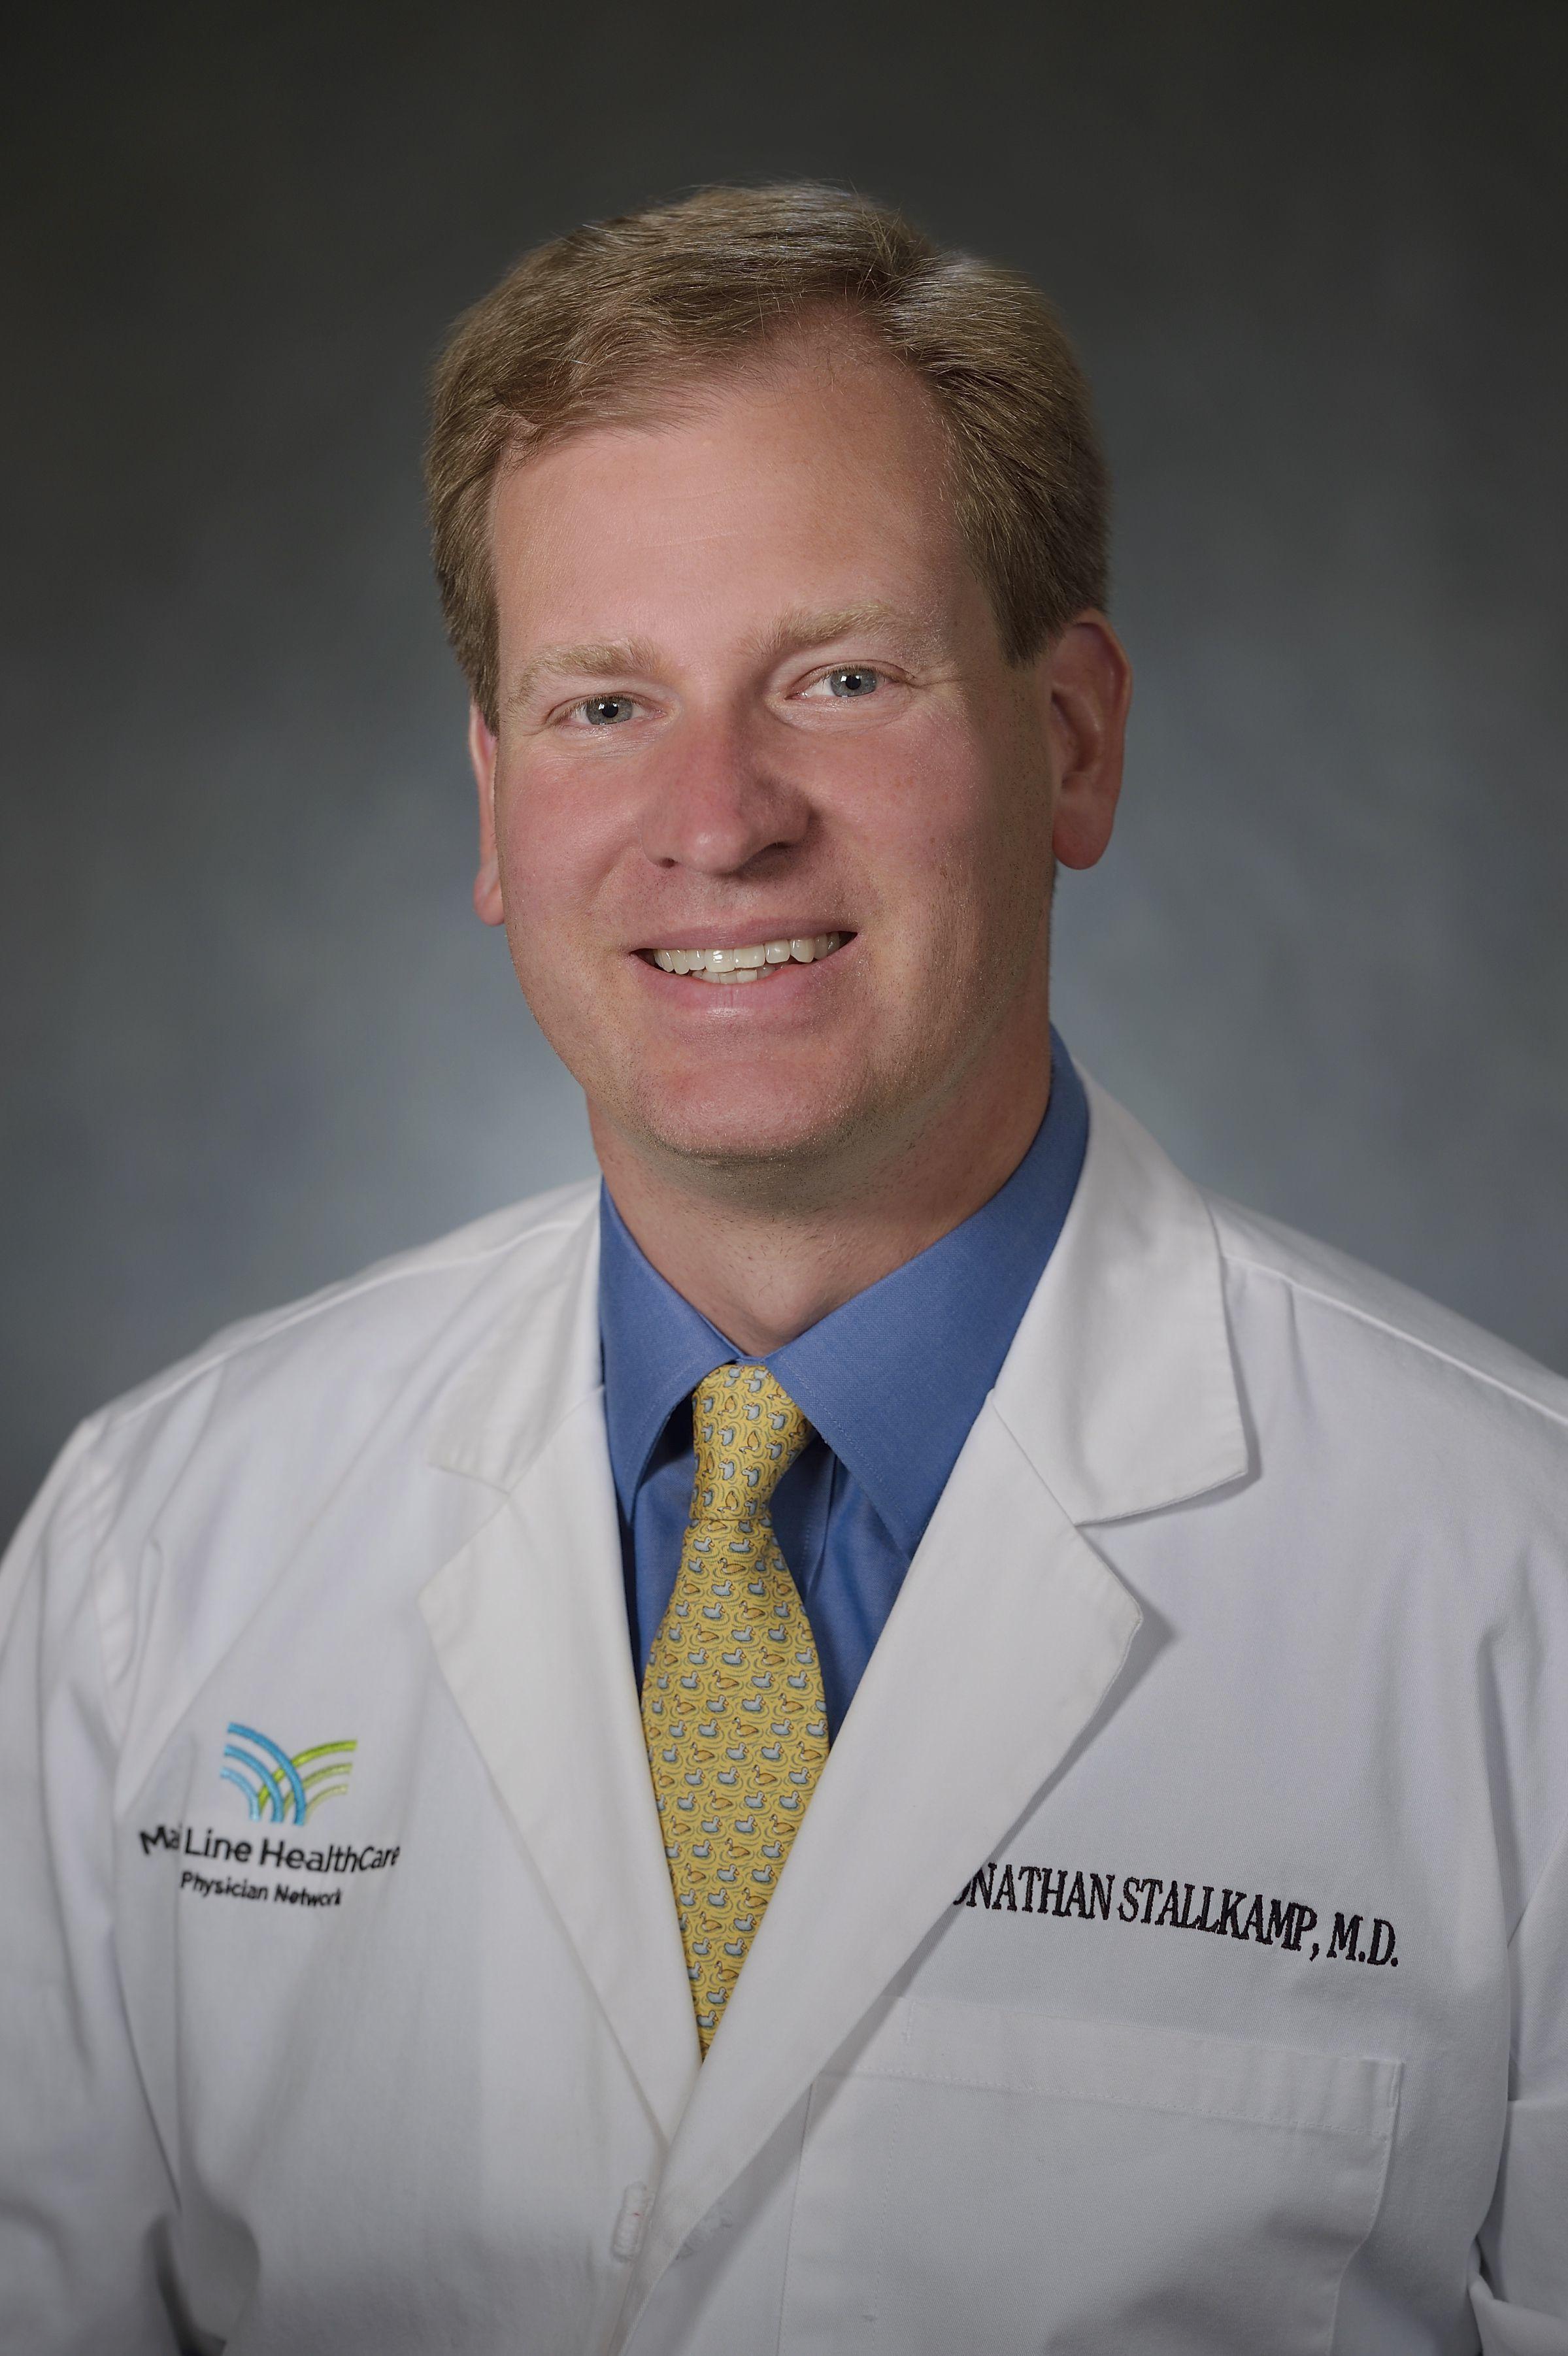 Jon Stallkamp is interim chief medical officer and regional vice president of medical affairs at Bryn Mawr Hospital and Lankenau Medical Center.